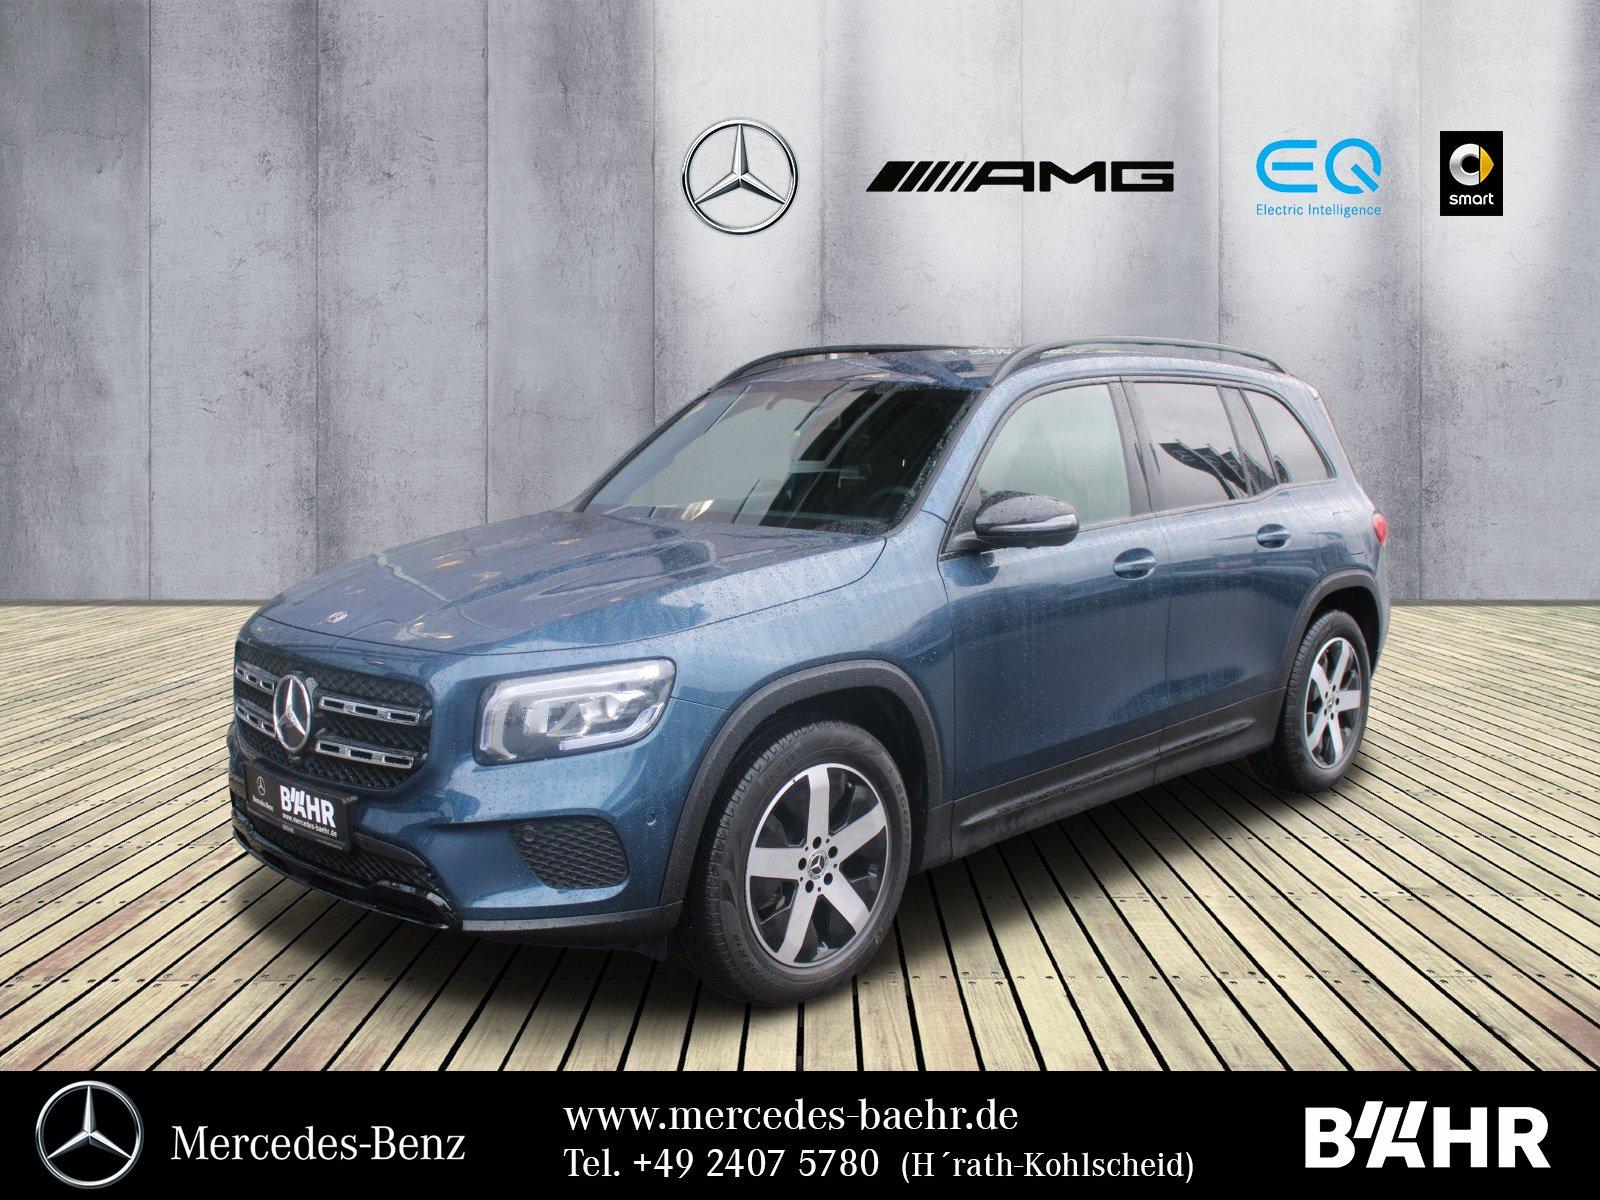 Mercedes-Benz GLB 200 Progressive/Navi/Autom./Klima/LED, Jahr 2020, Benzin